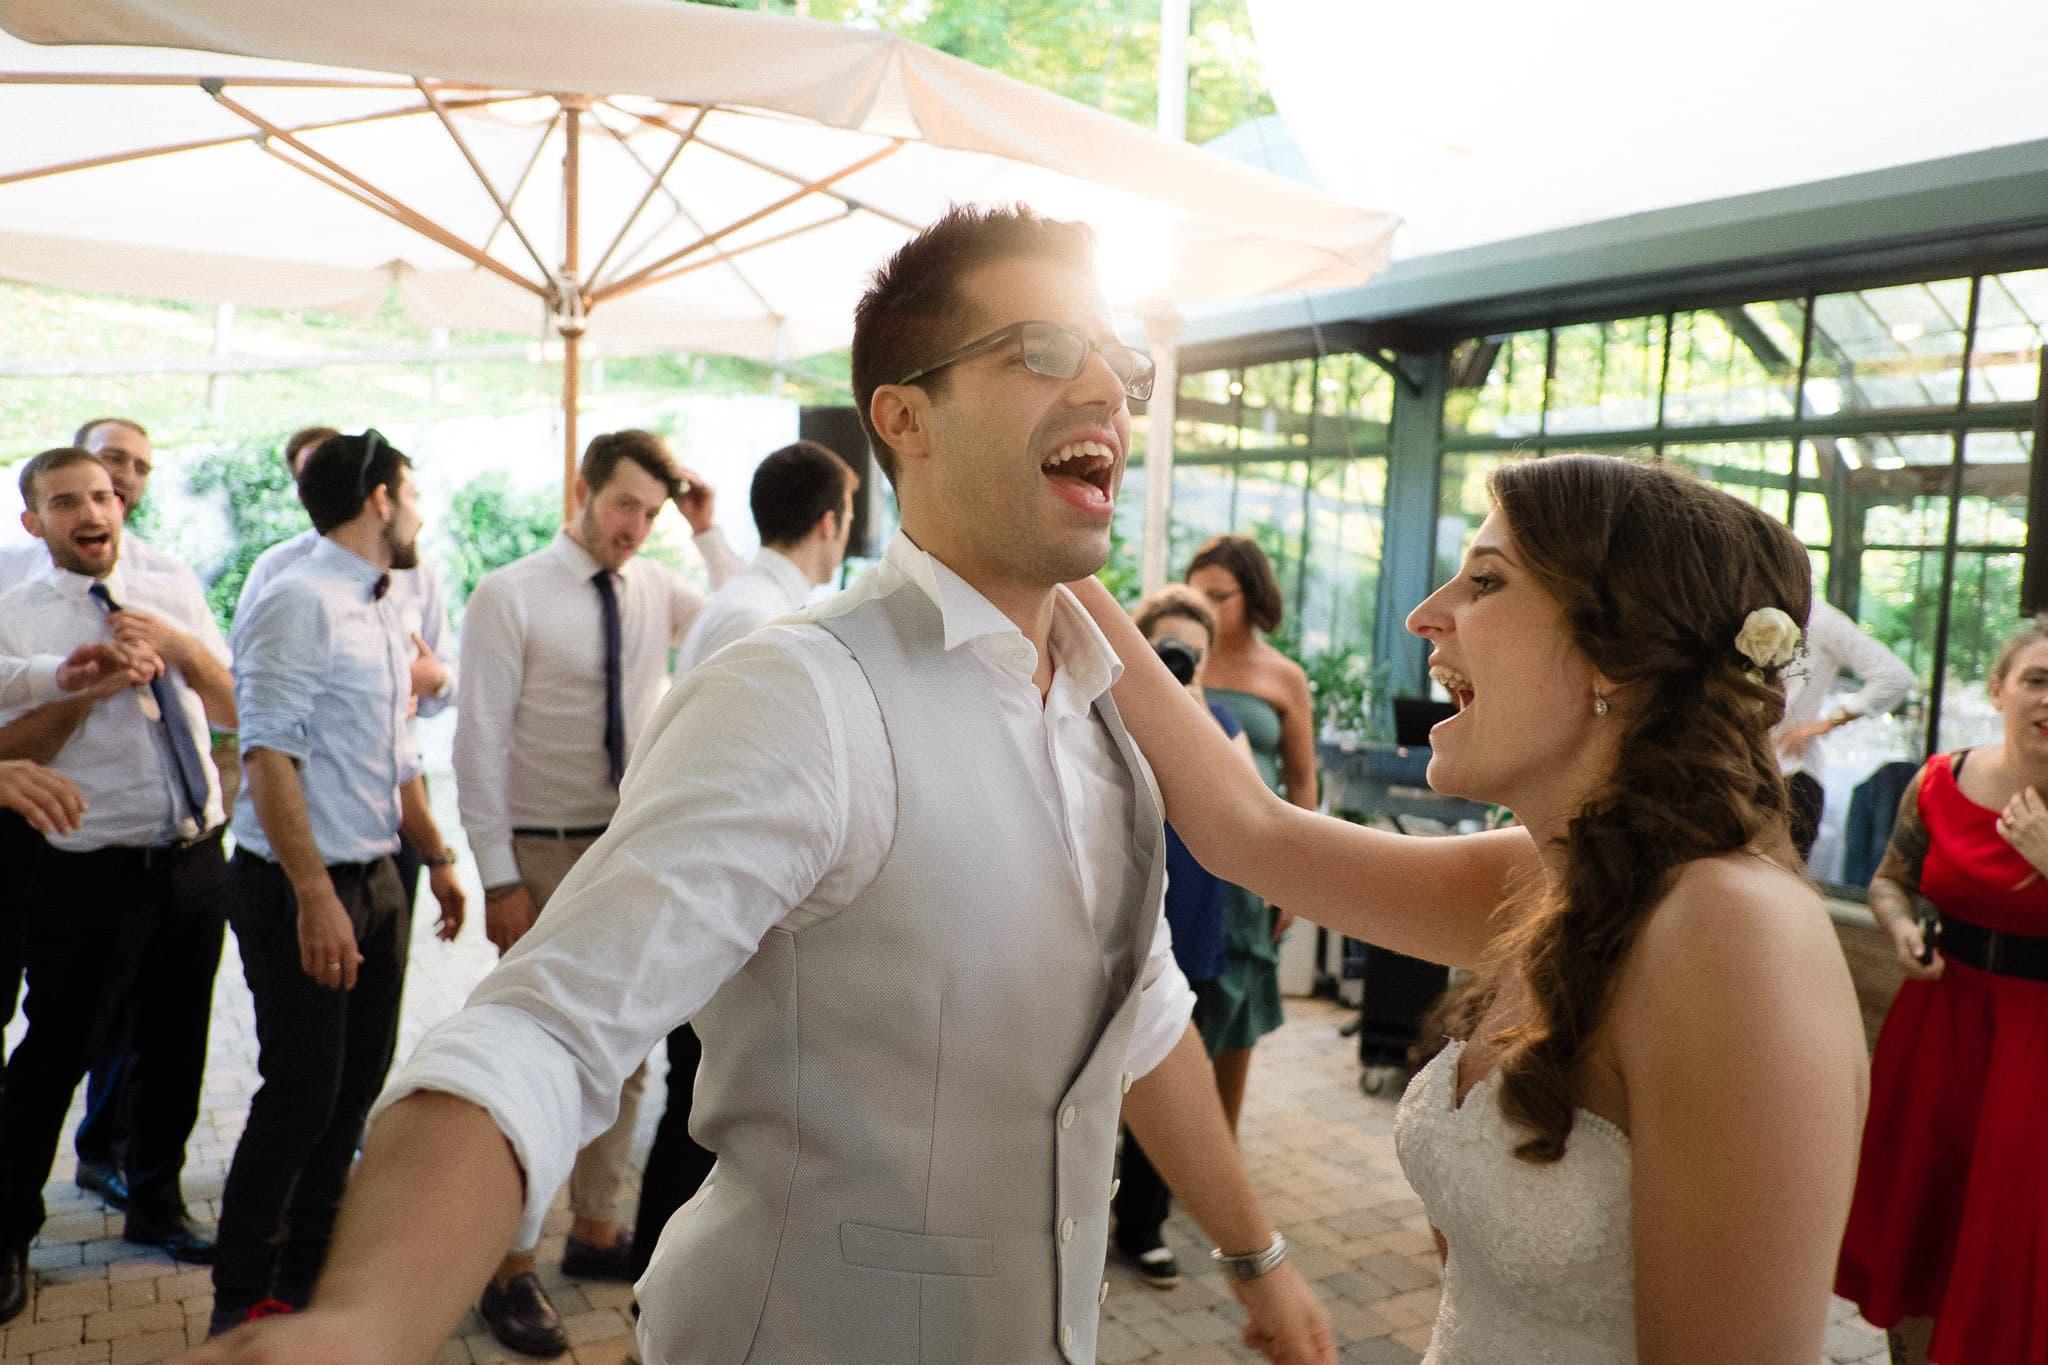 fotografo matrimonio cascina diodona varese lucarossifoto 00043